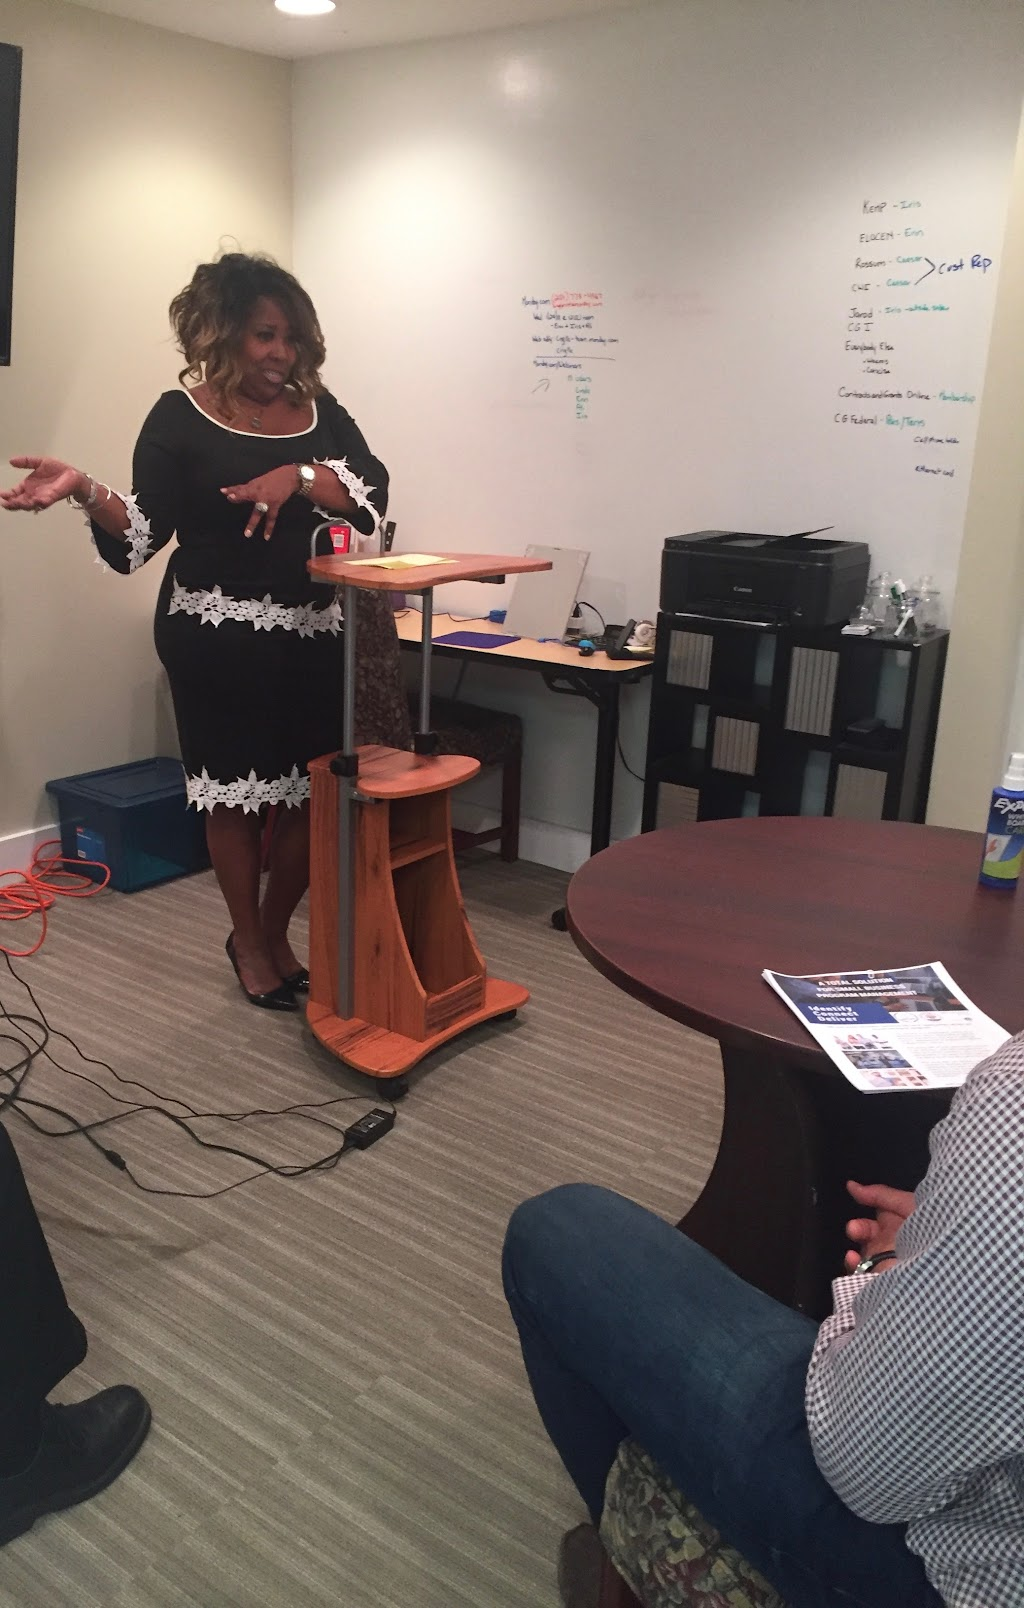 Linda CHatmon training at Contracts & Grants, LLC